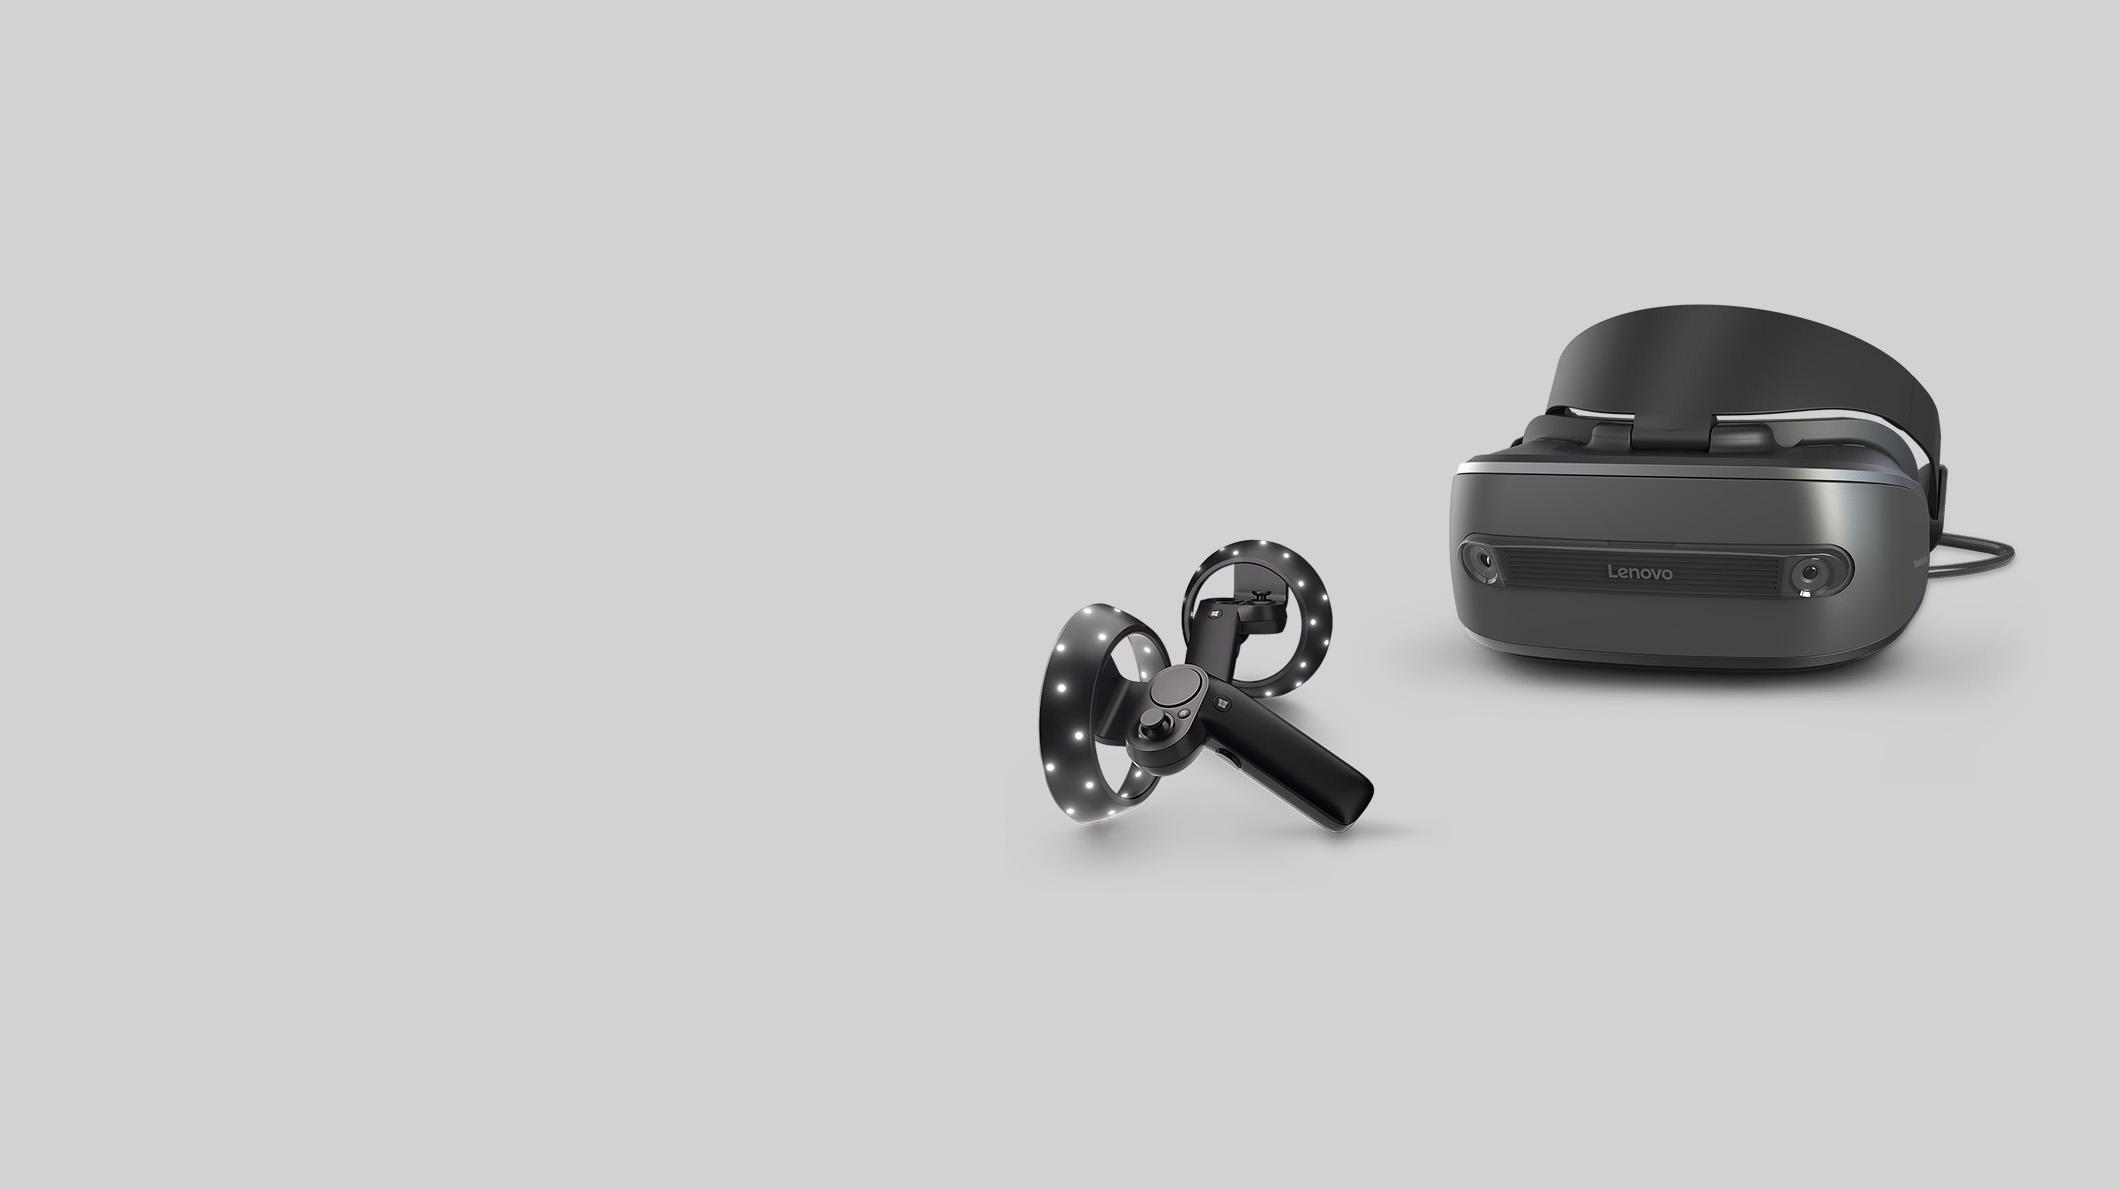 Lenovo Explorer Windows Mixed Reality headset